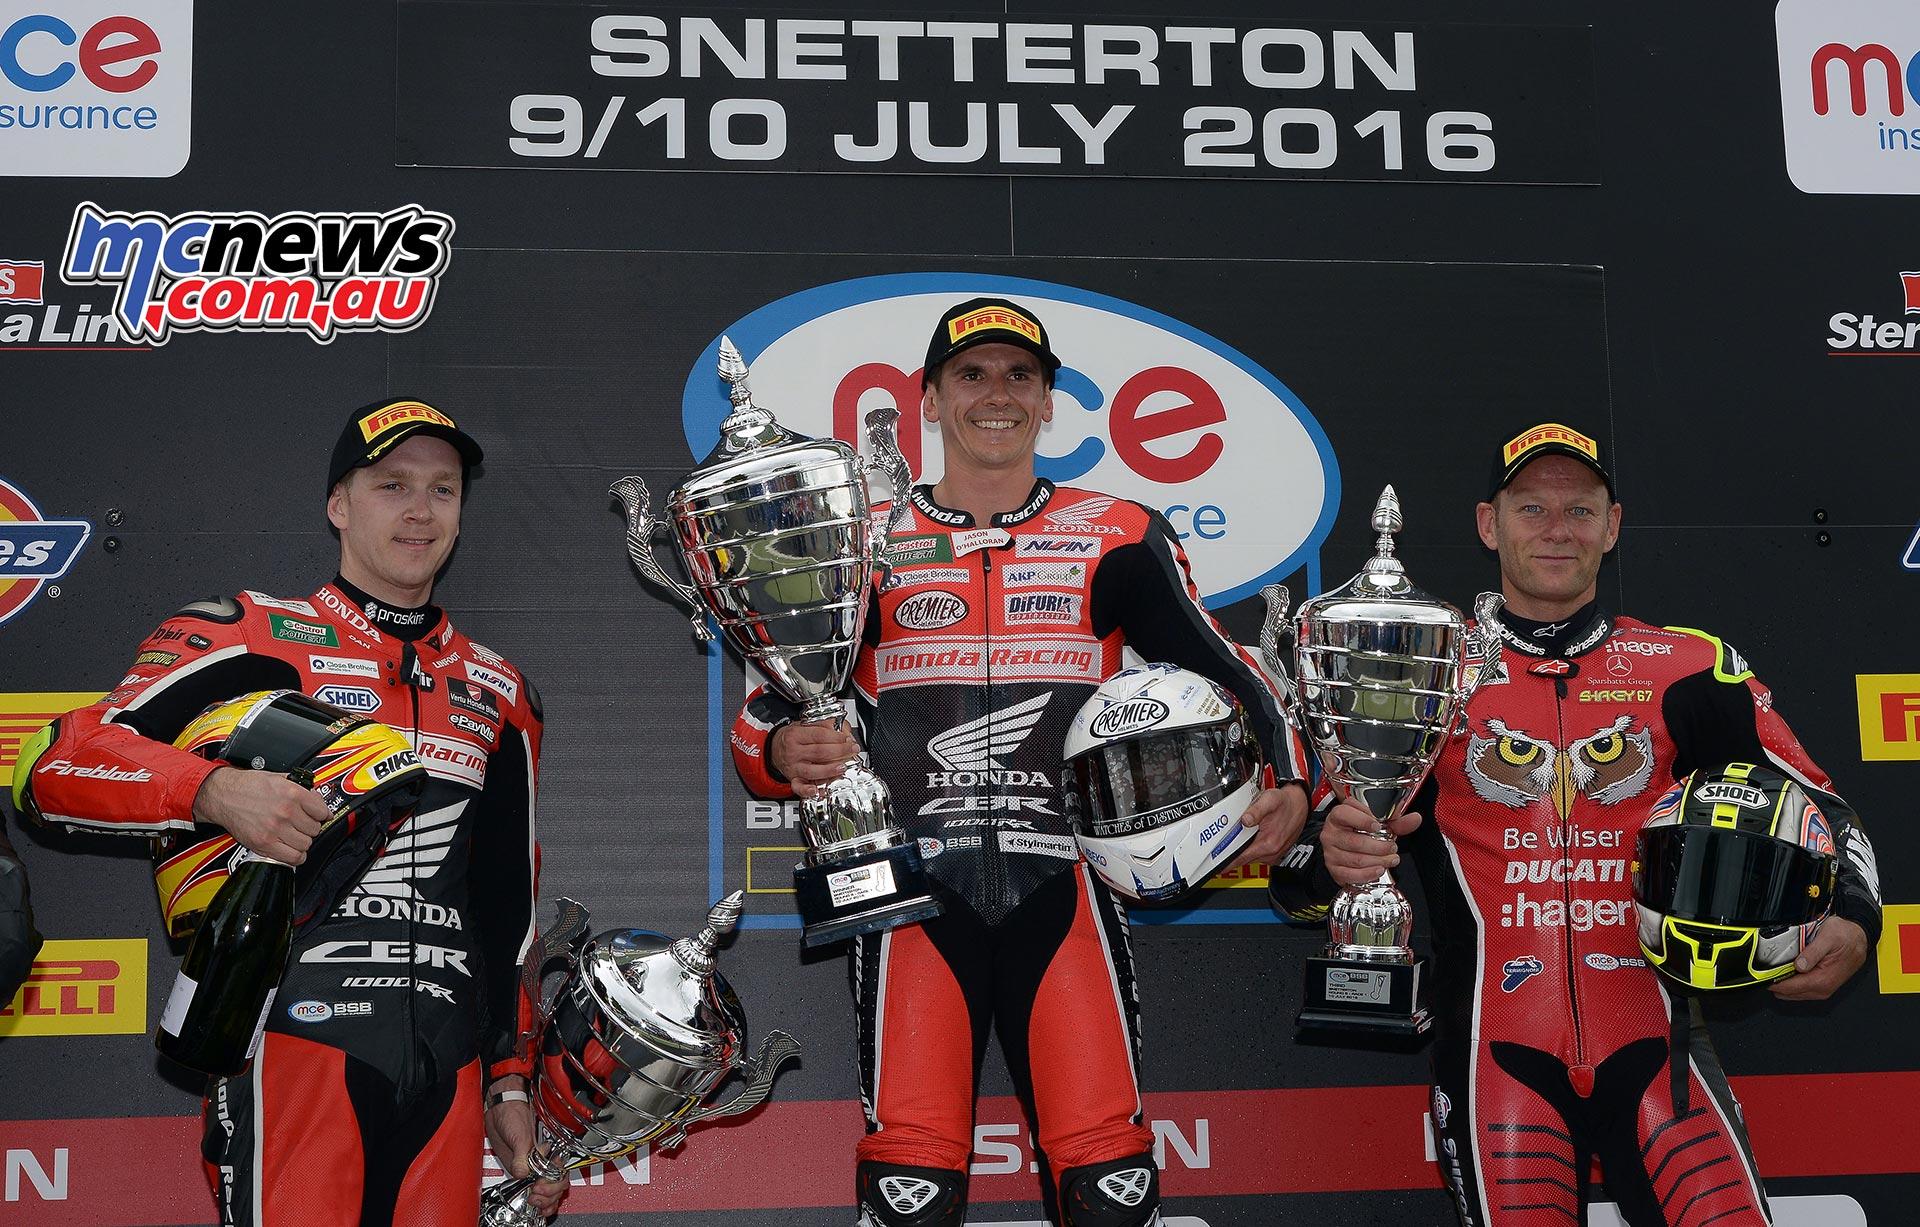 jason o halloran takes snetterton bsb race win mcnews com au jason o halloran takes snetterton bsb race win